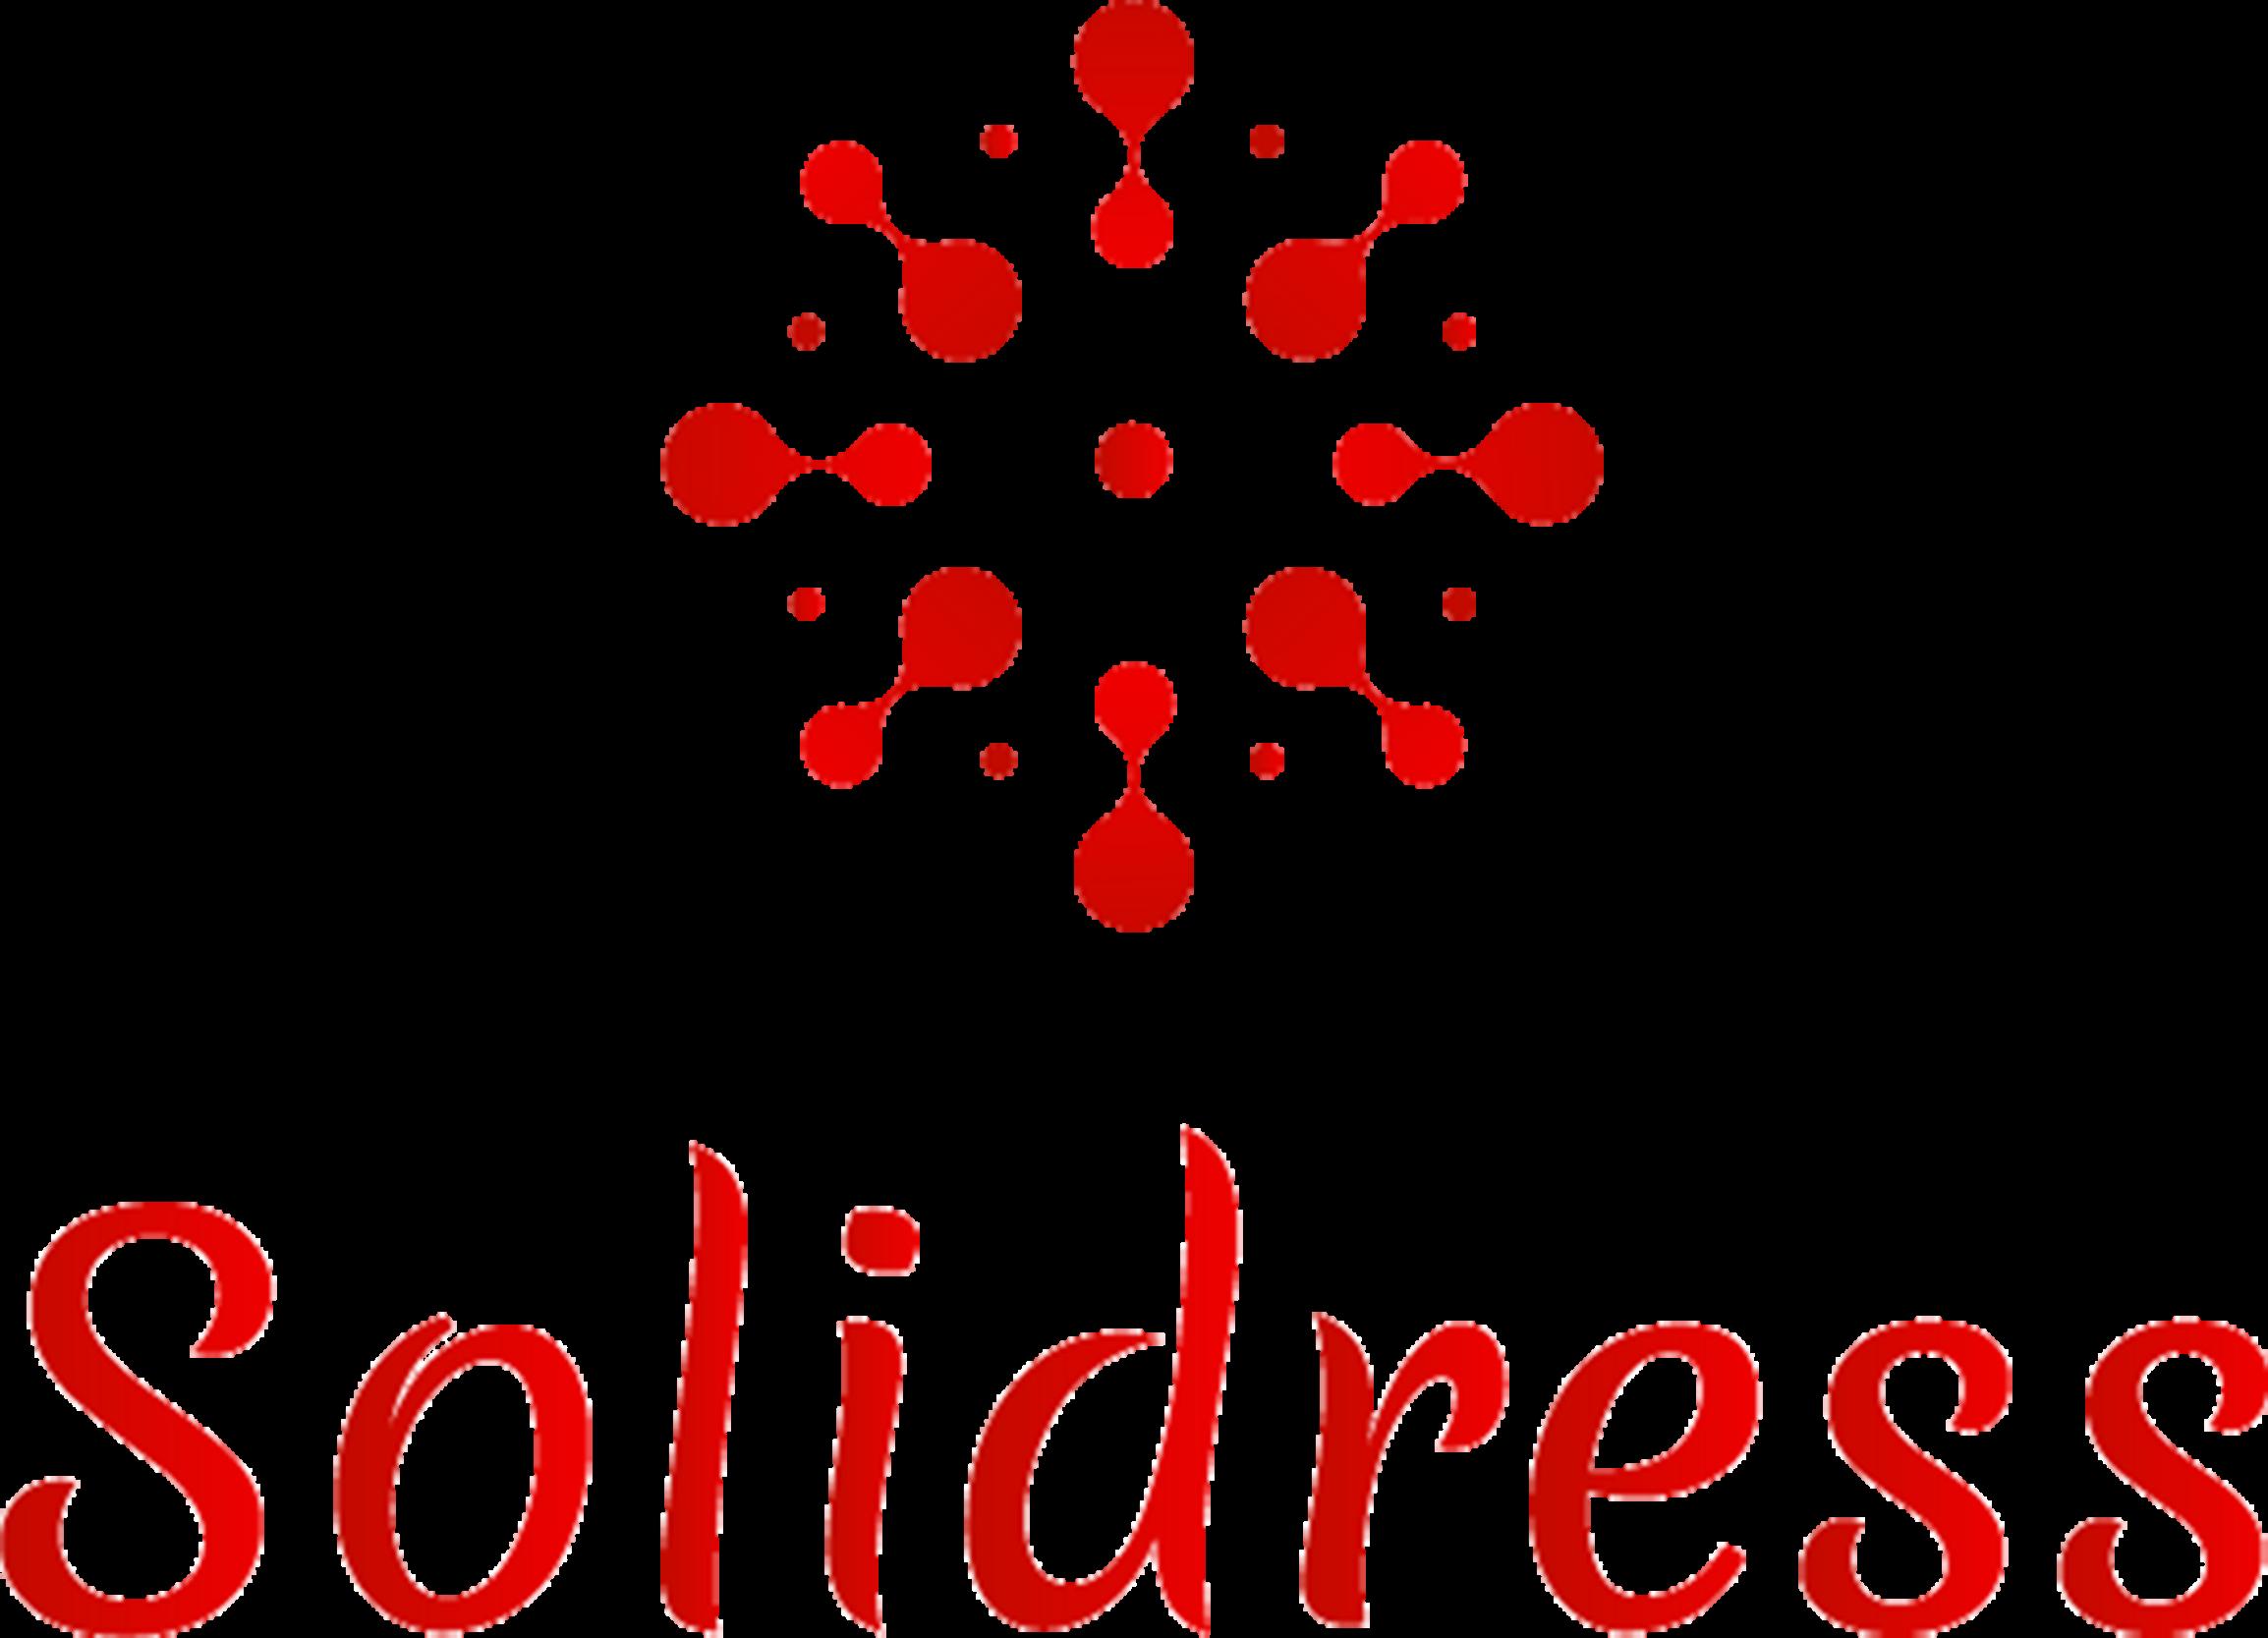 Solidress